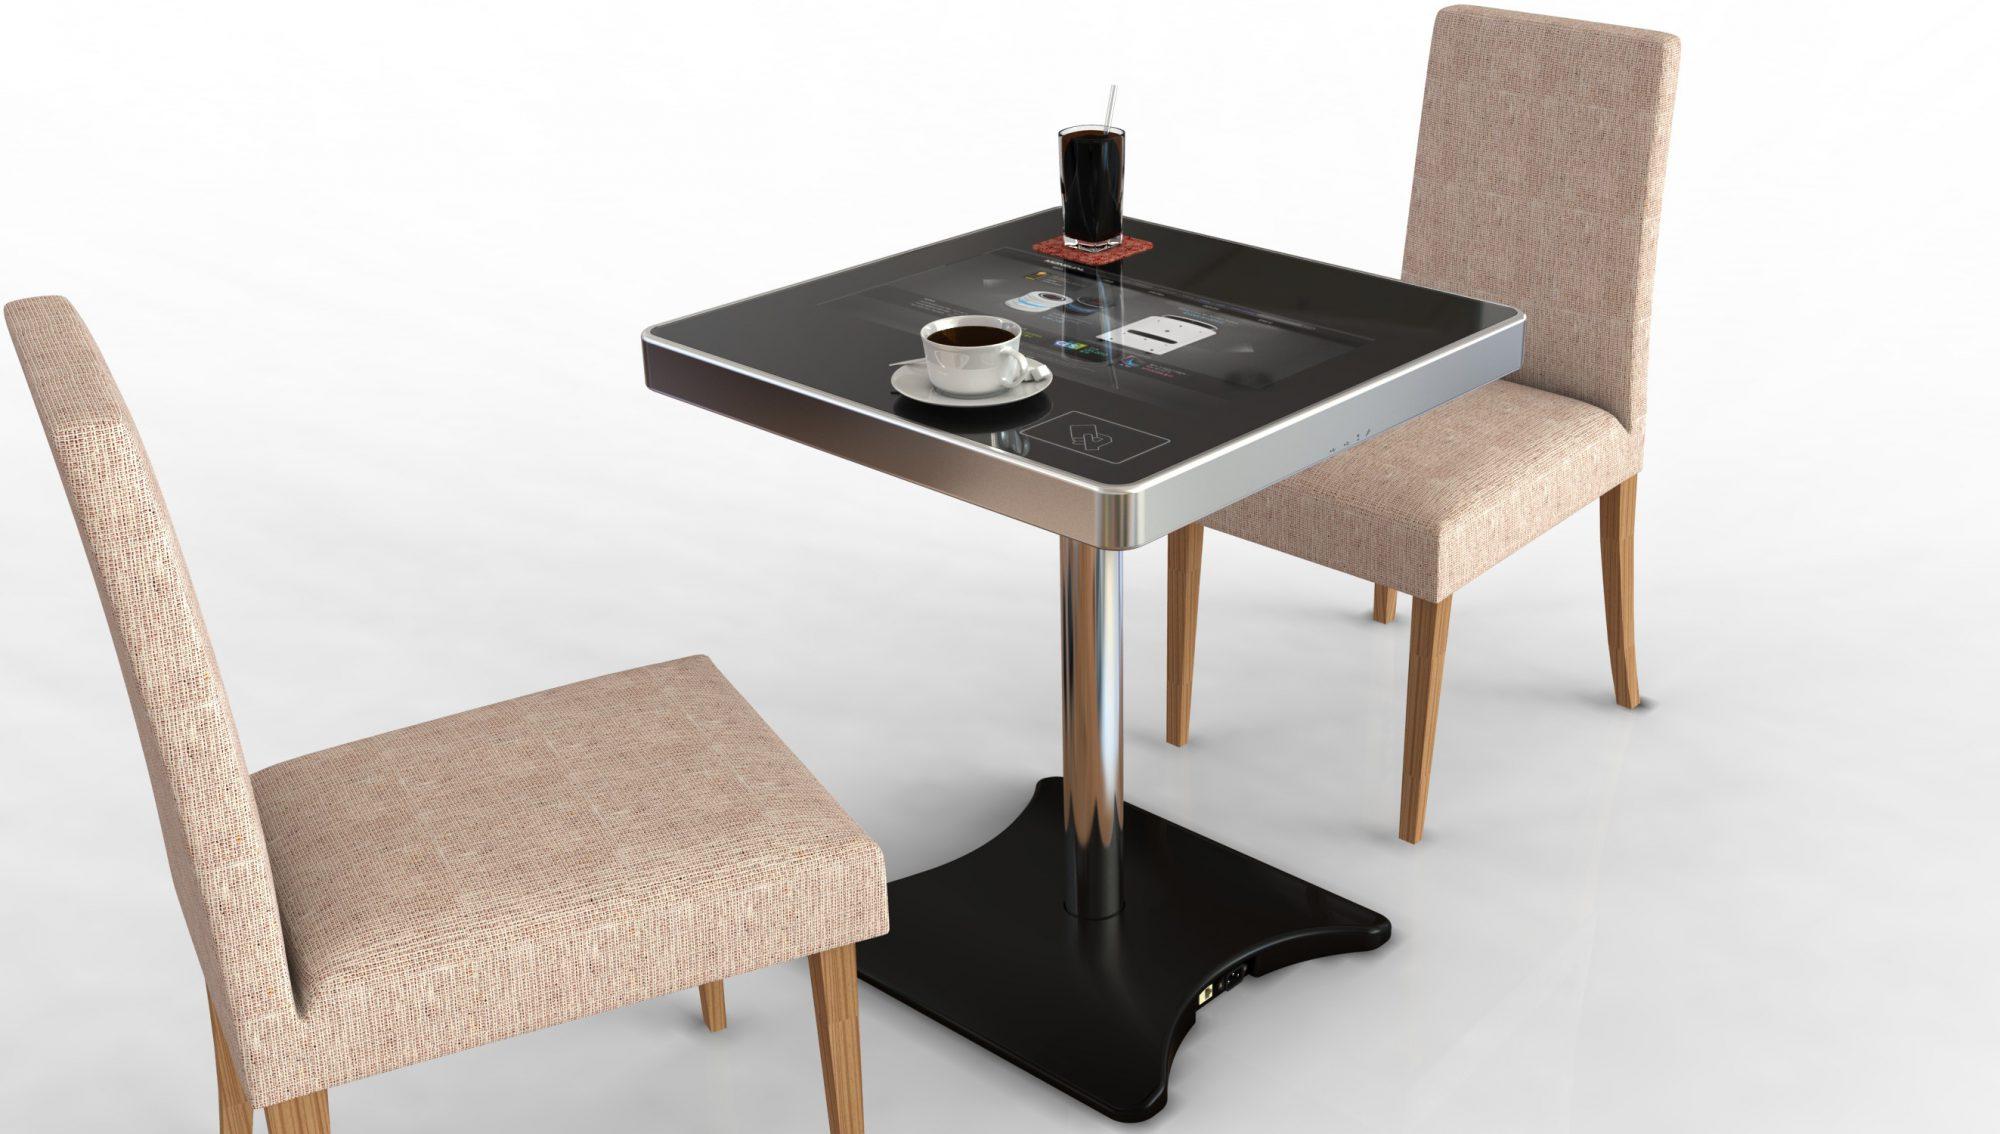 1-table-pc-ART1_1